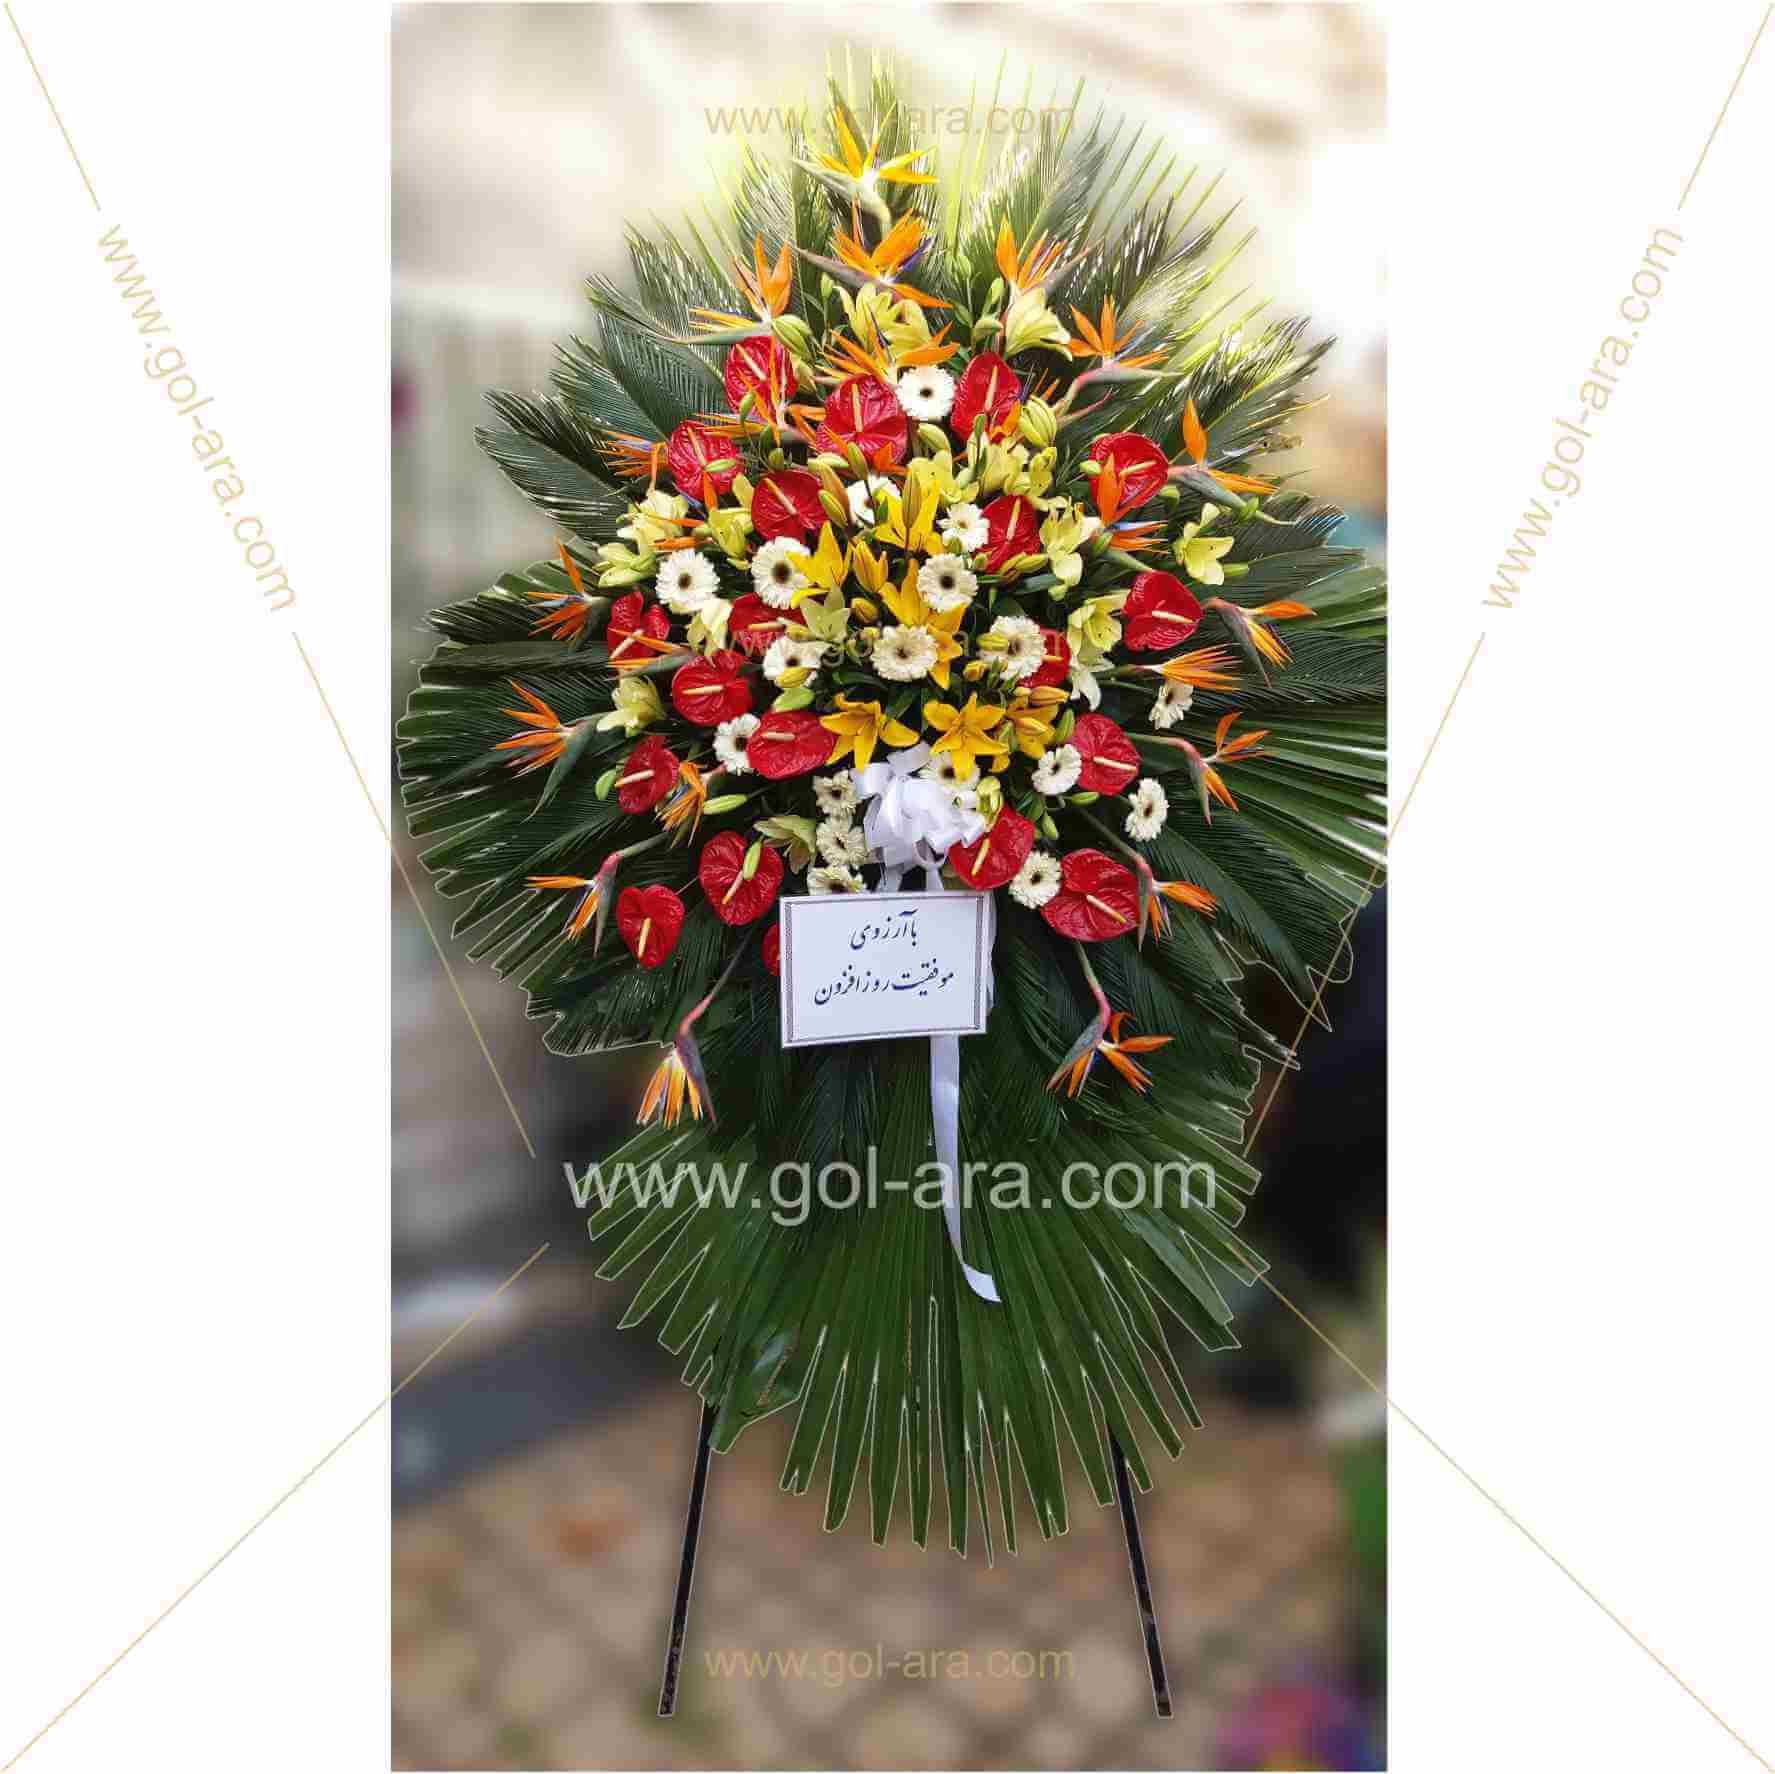 ارسال تاج گل تبریک